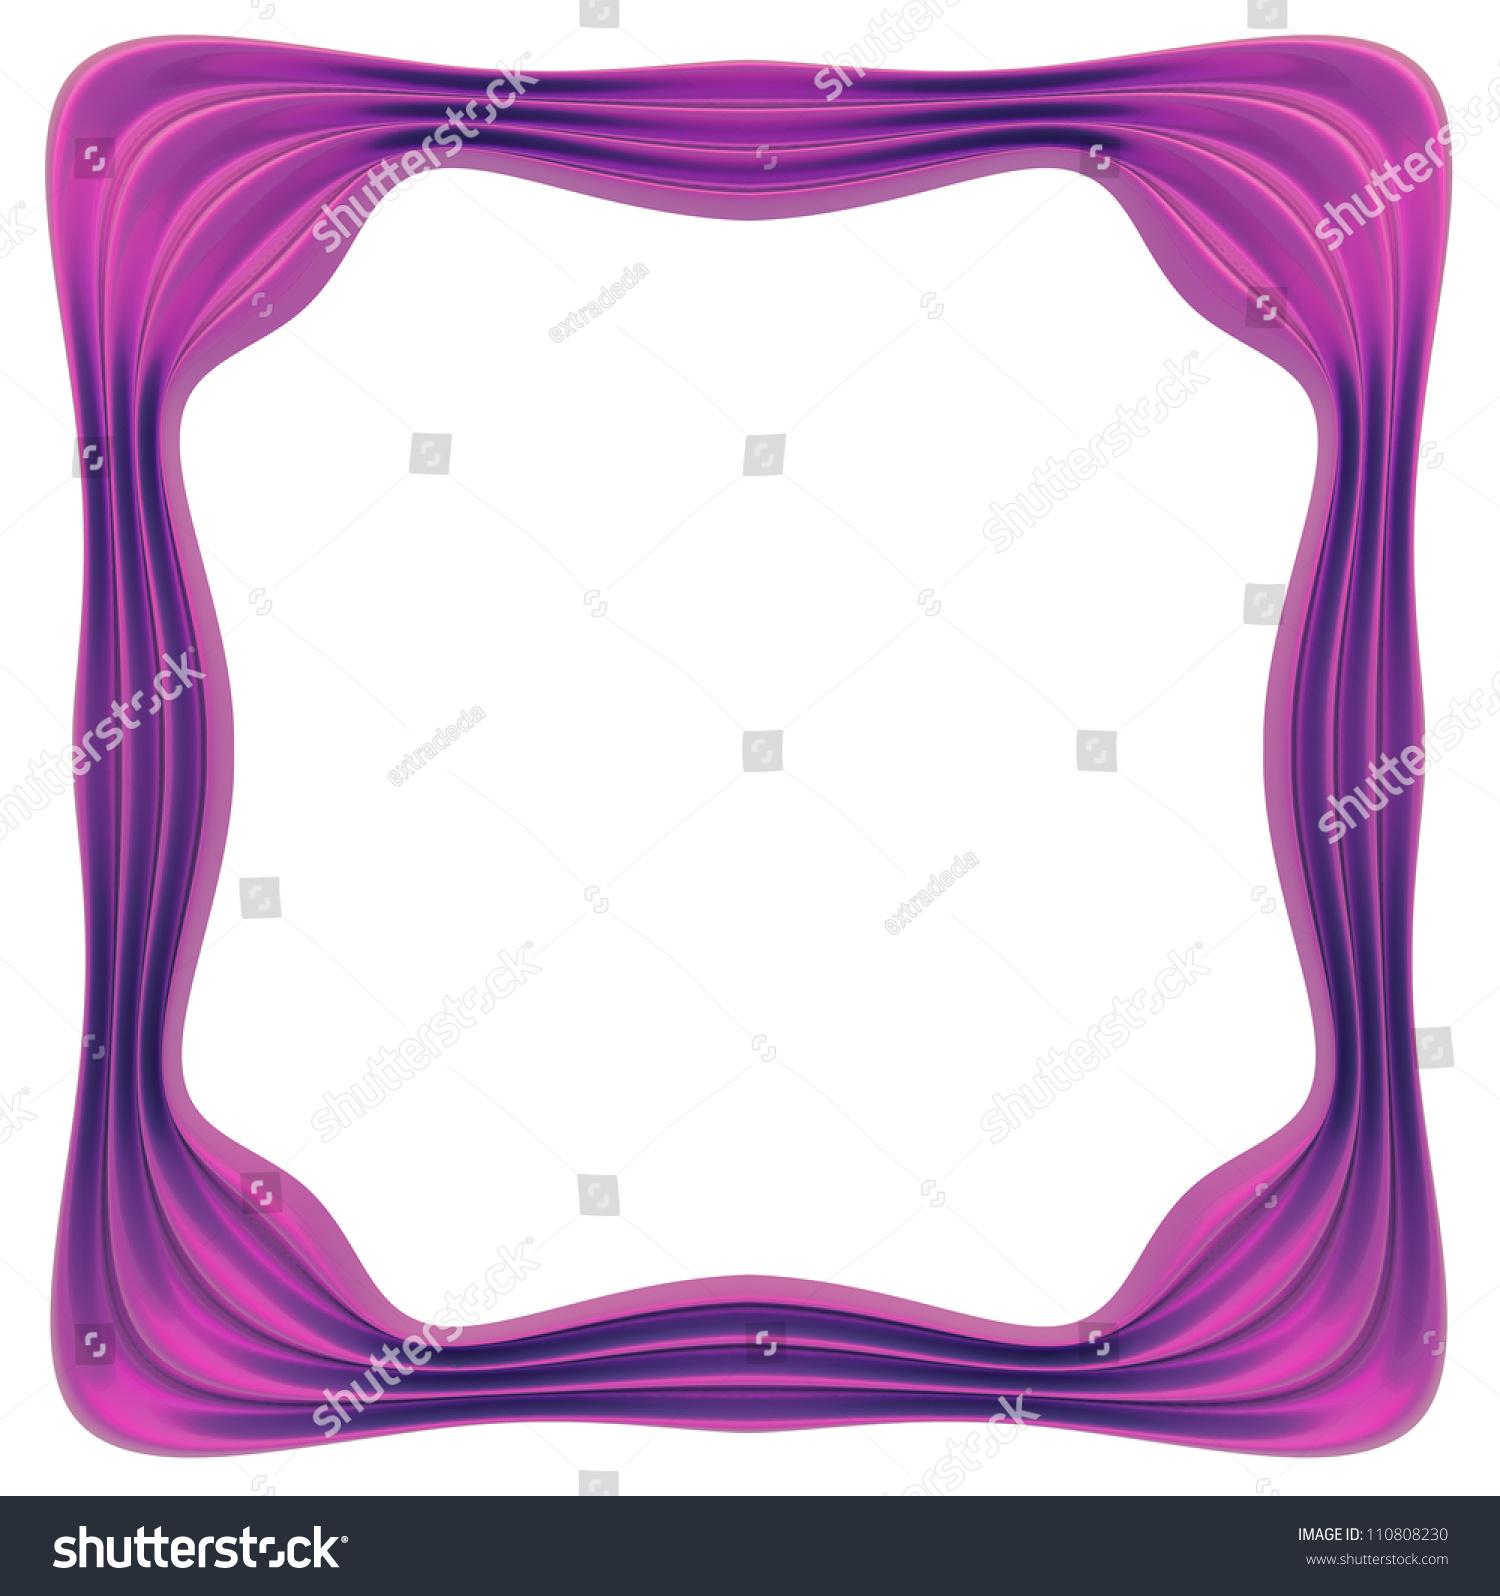 Violet rectangle frame white background stock illustration violet rectangle frame white background jeuxipadfo Gallery